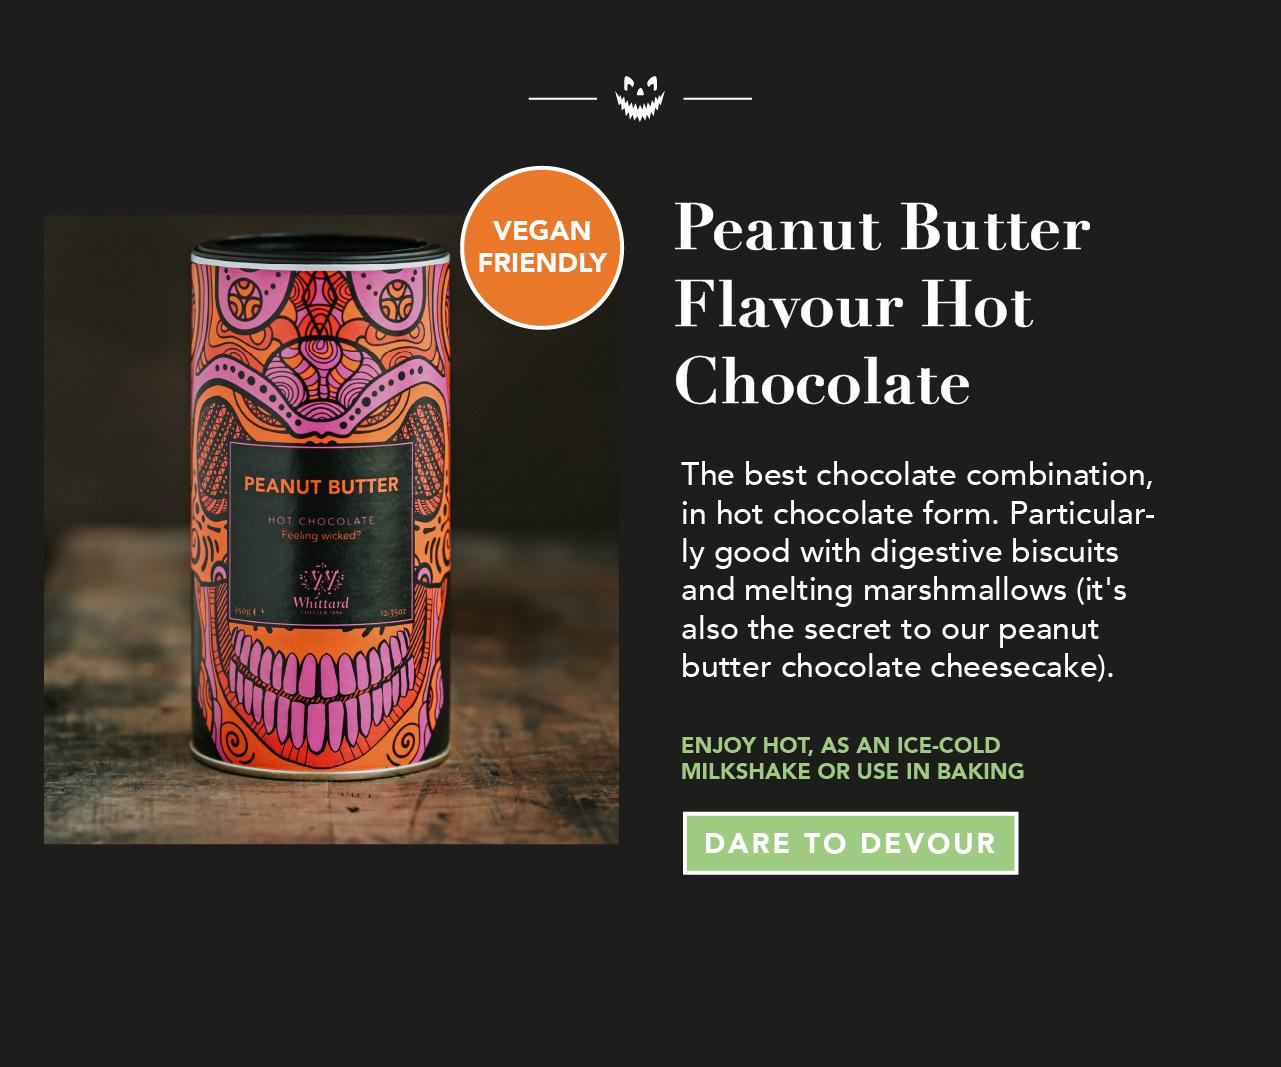 Peanut Butter Flavour Hot Chocolate